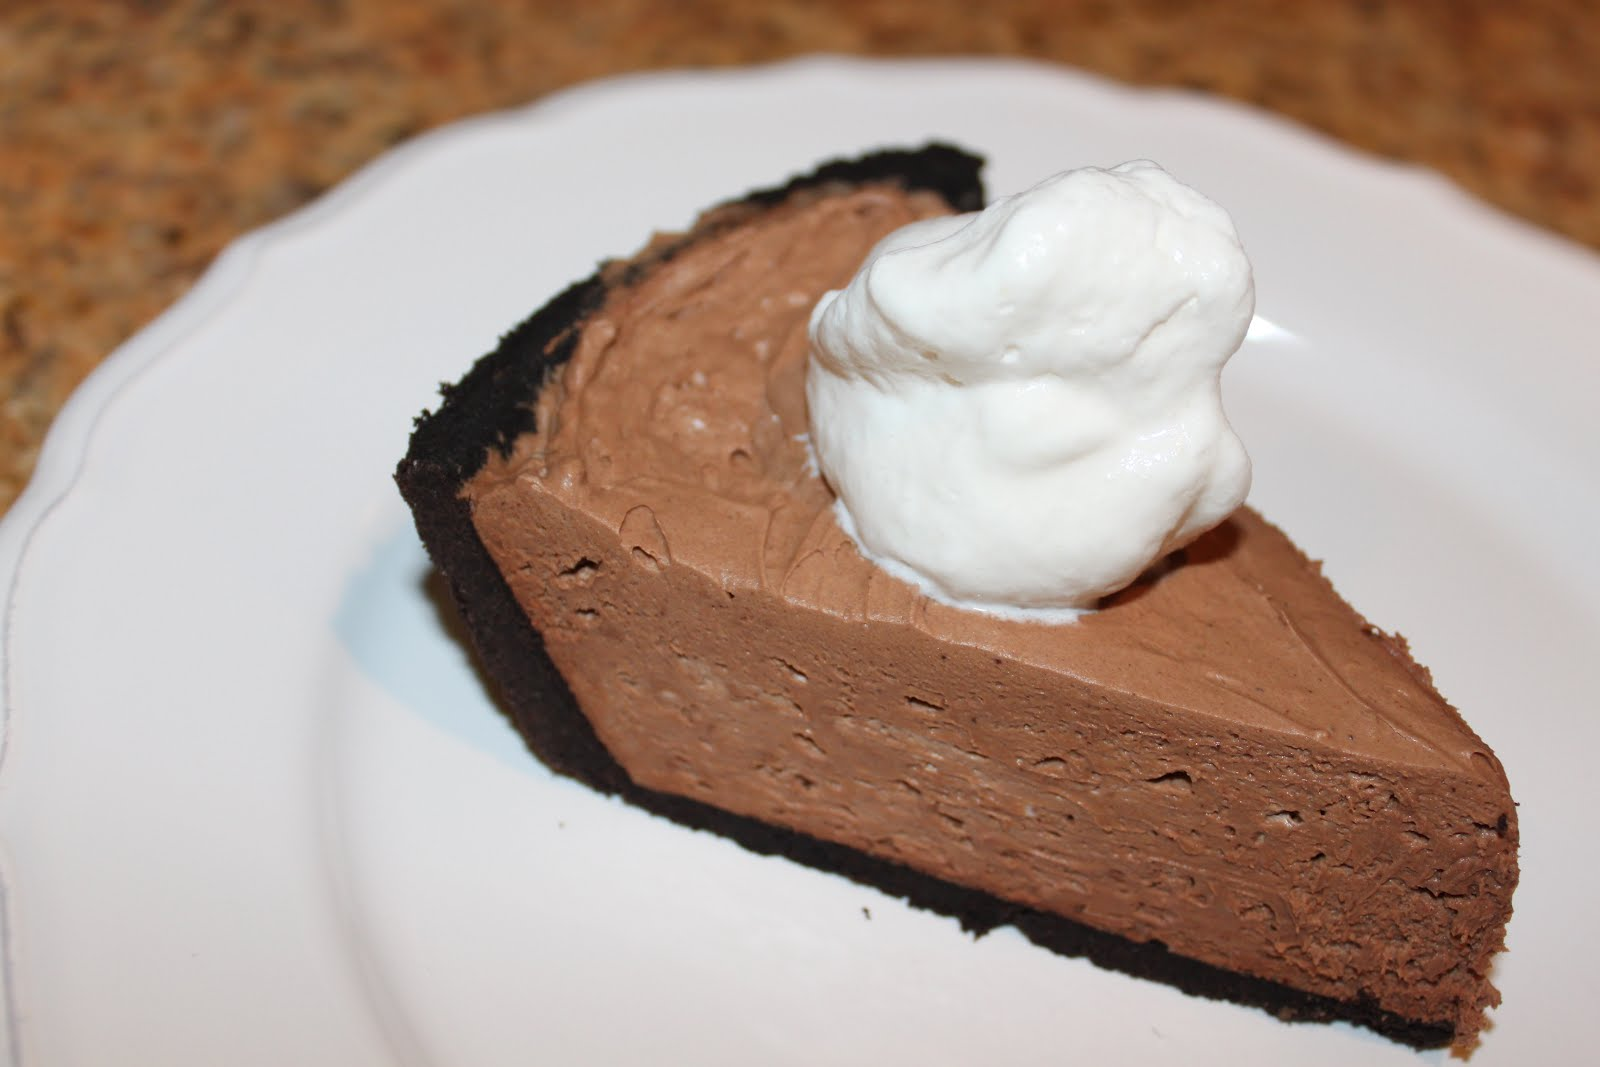 CARRIE'S COOKING CORNER: No-Bake Chocolate Cheesecake